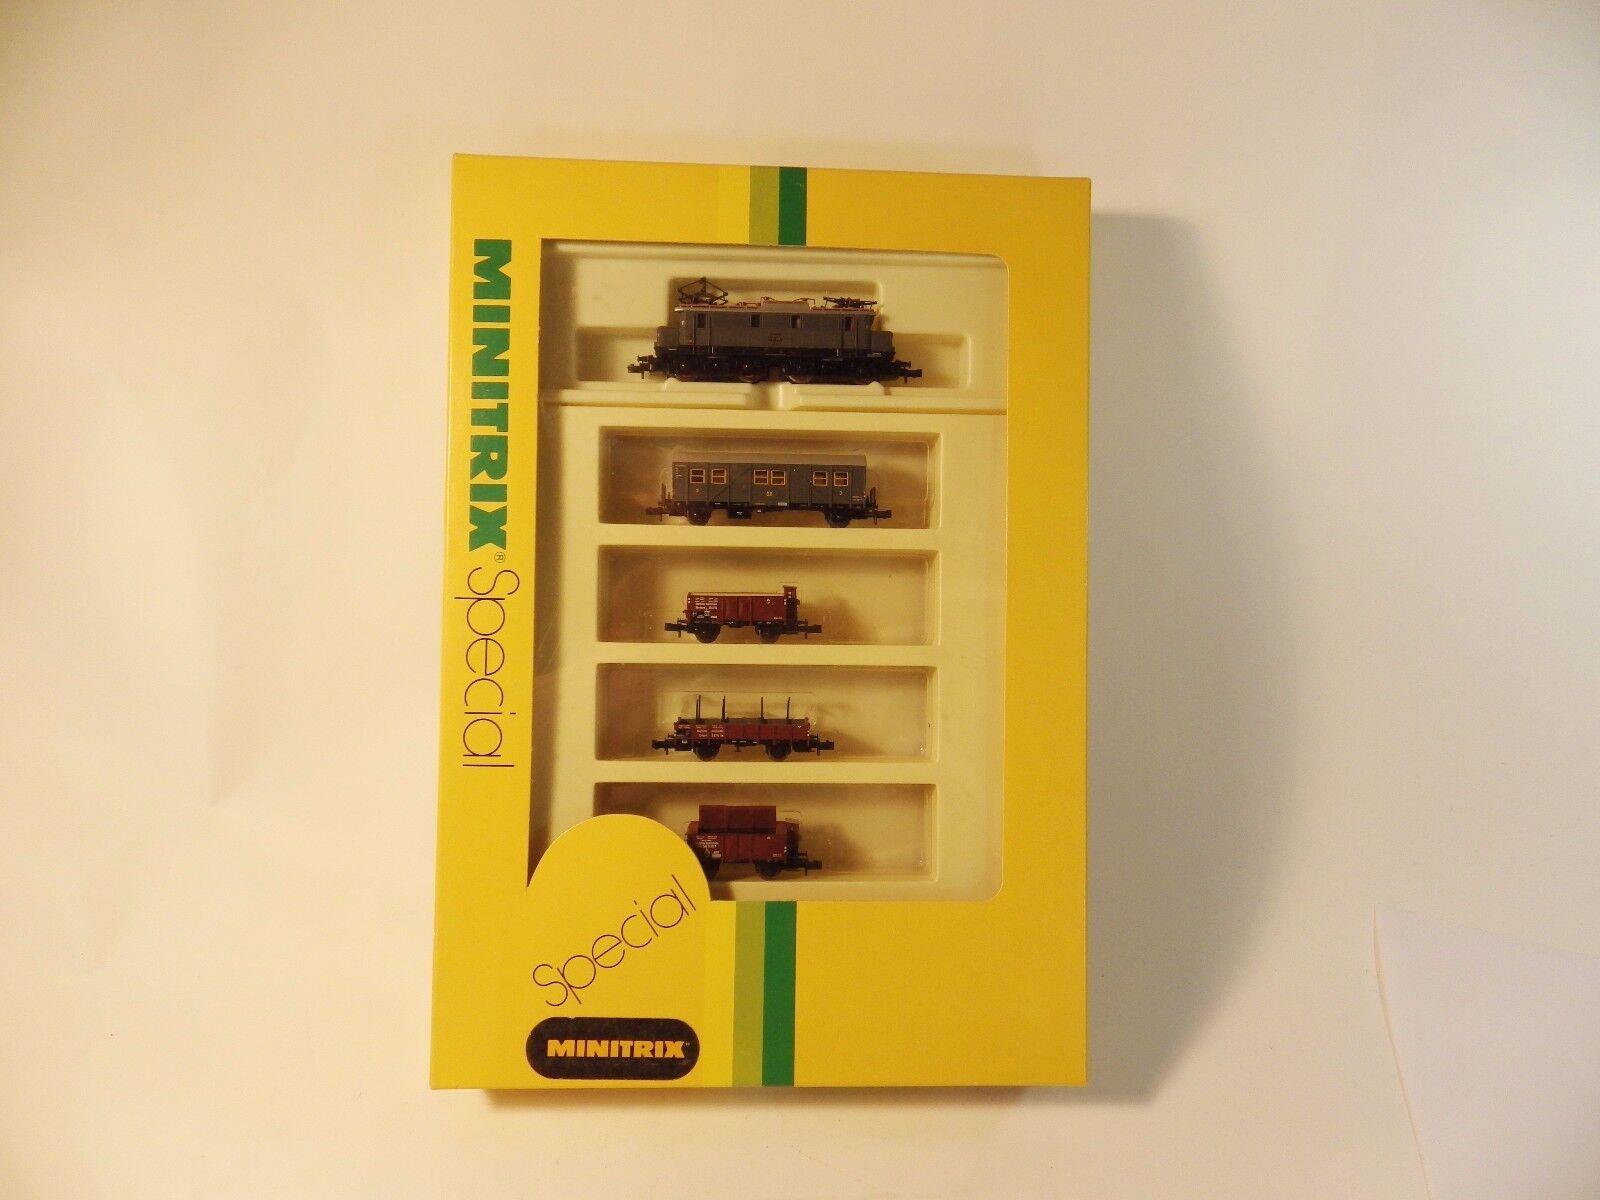 Minitrix 11014 Spur N, 5-parte. treno merci-Set, Lok DR 89643, Ep. II, OVP, MDL